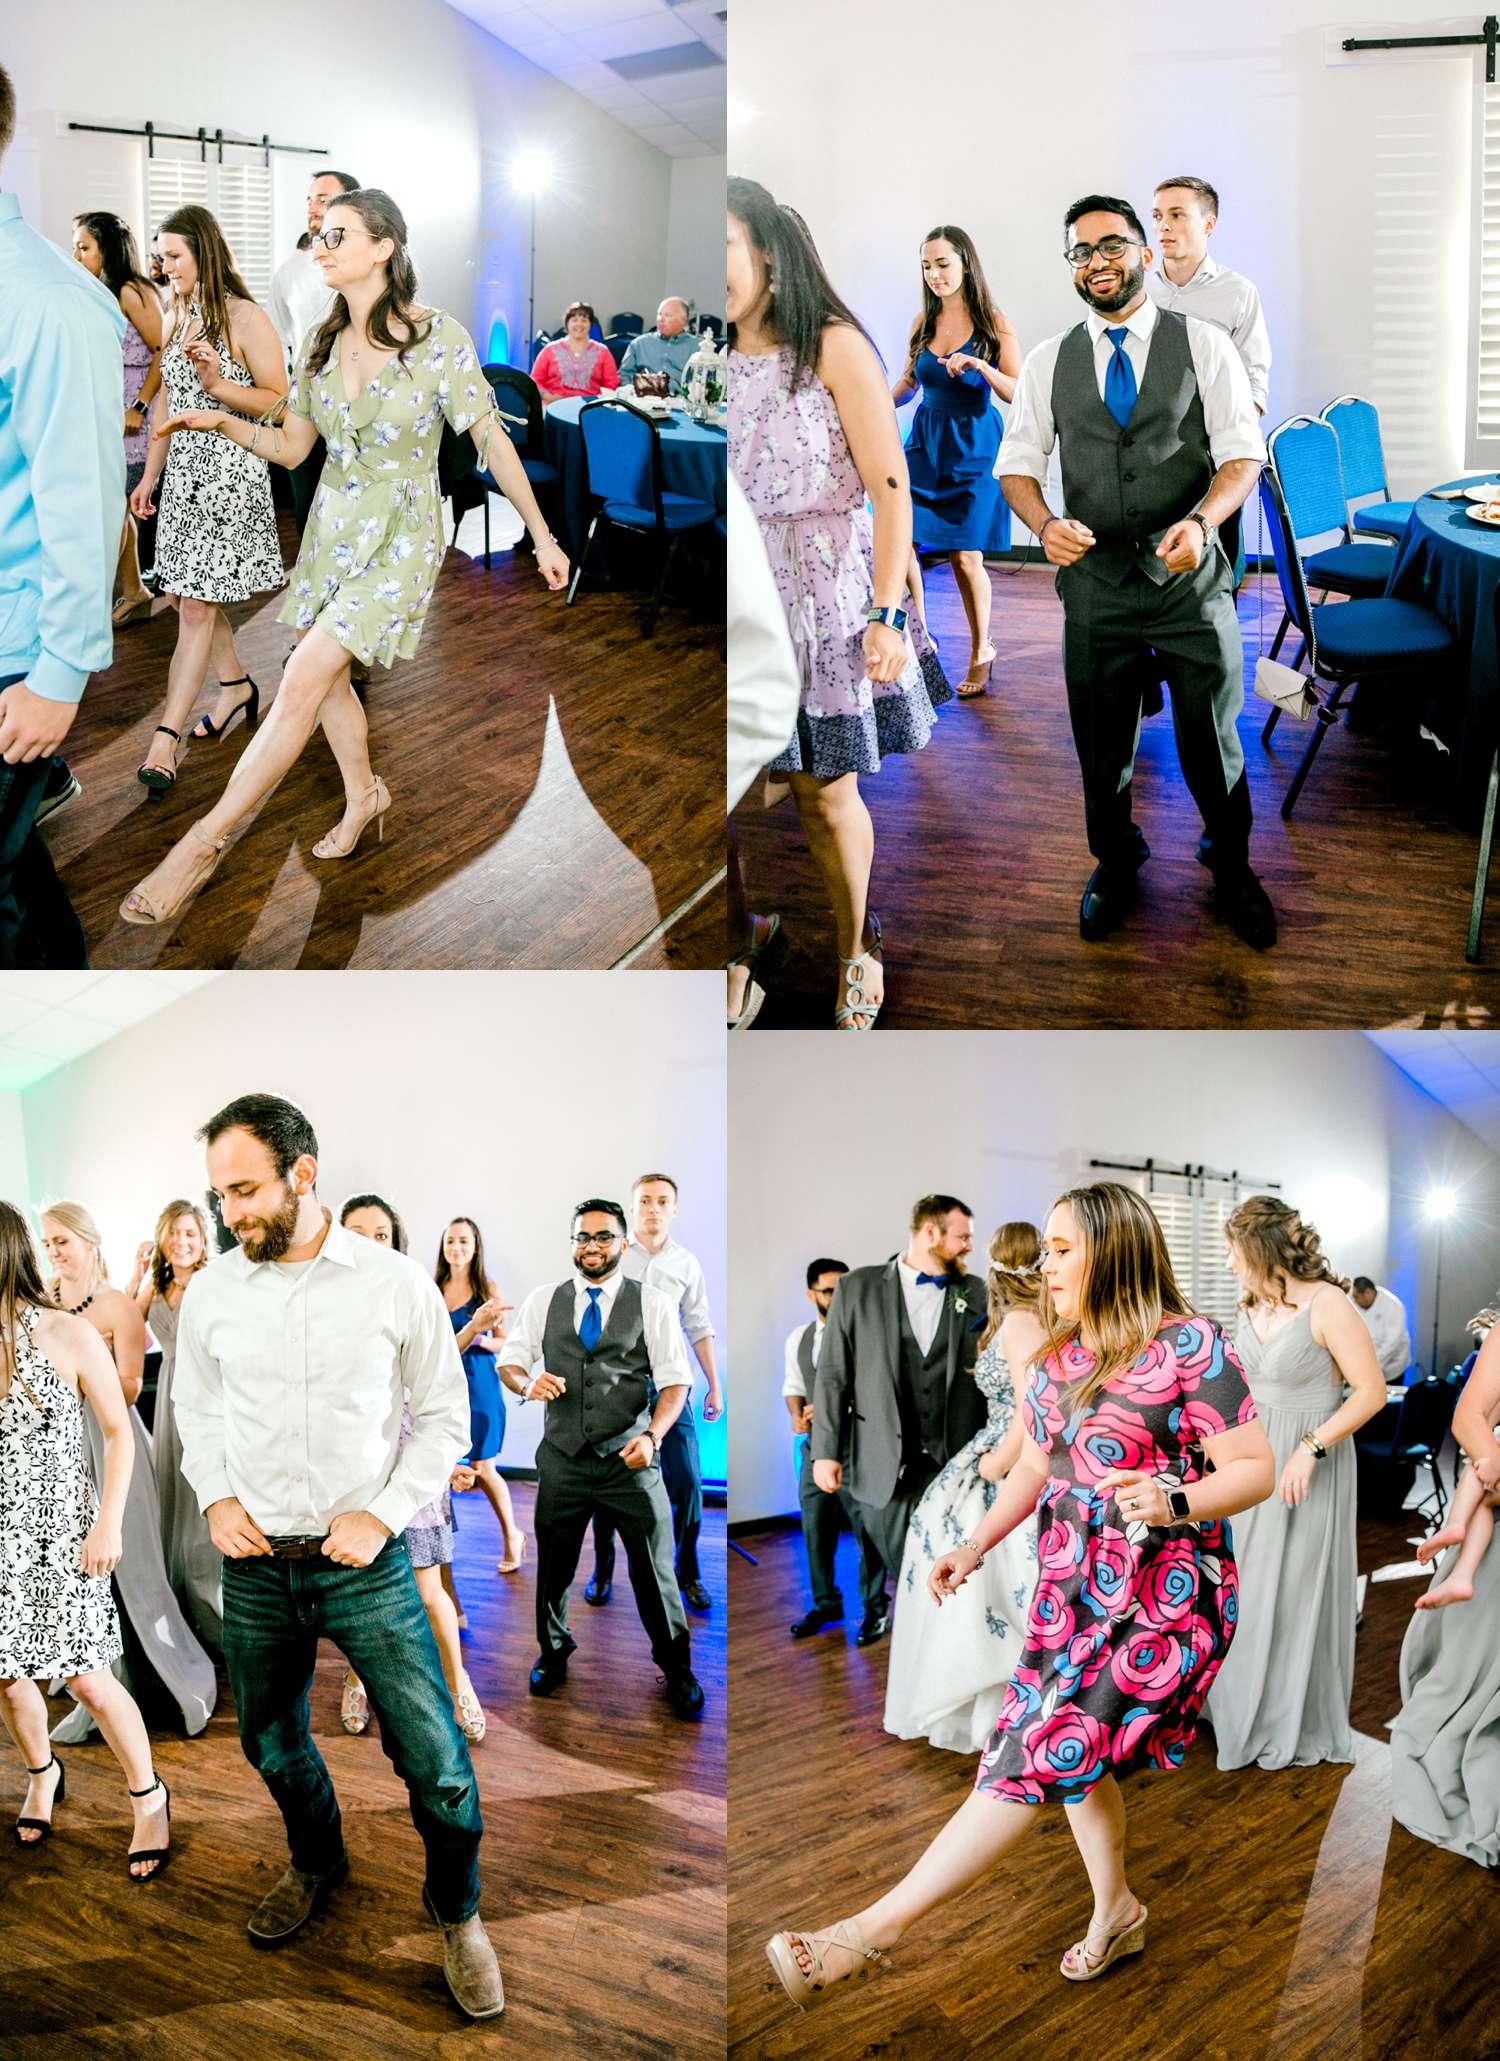 TY+NATHAN+HALLIER+ALLEEJ+WEDDING+PHOTOGRAPHER+RANSOM+CANYON_0117.jpg